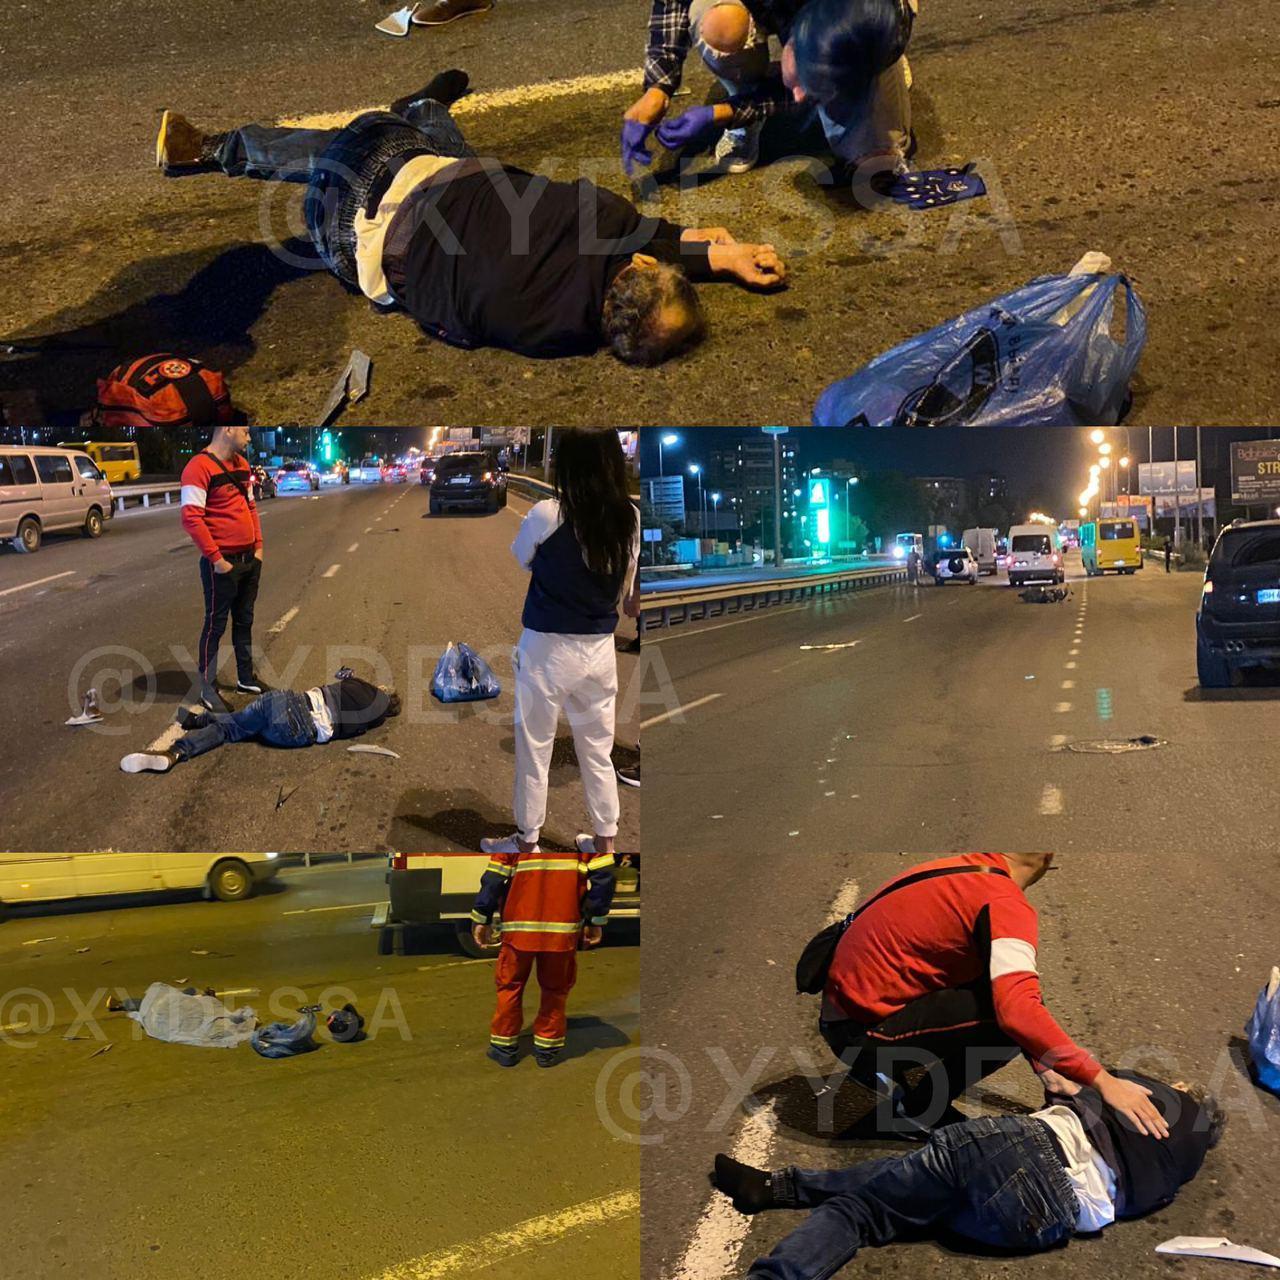 Авария на поселке Котовского. Фото: телеграм-канал ХО